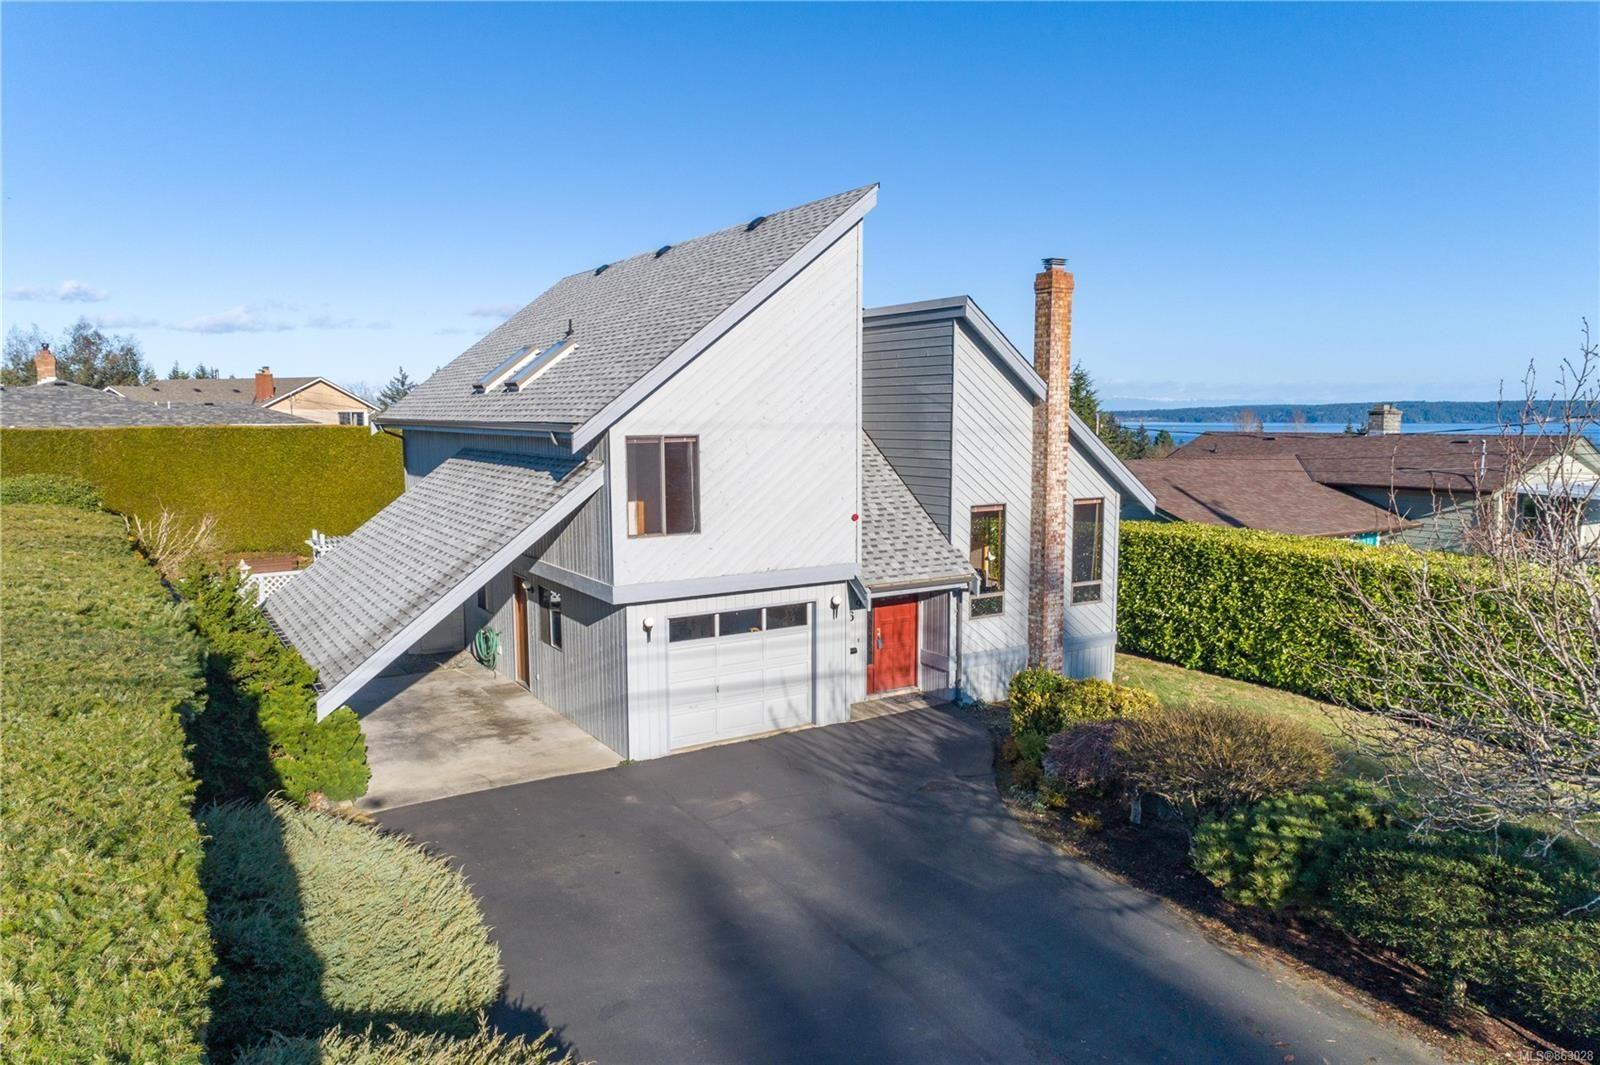 Main Photo: 3169 Sunset Dr in : Du Chemainus House for sale (Duncan)  : MLS®# 863028